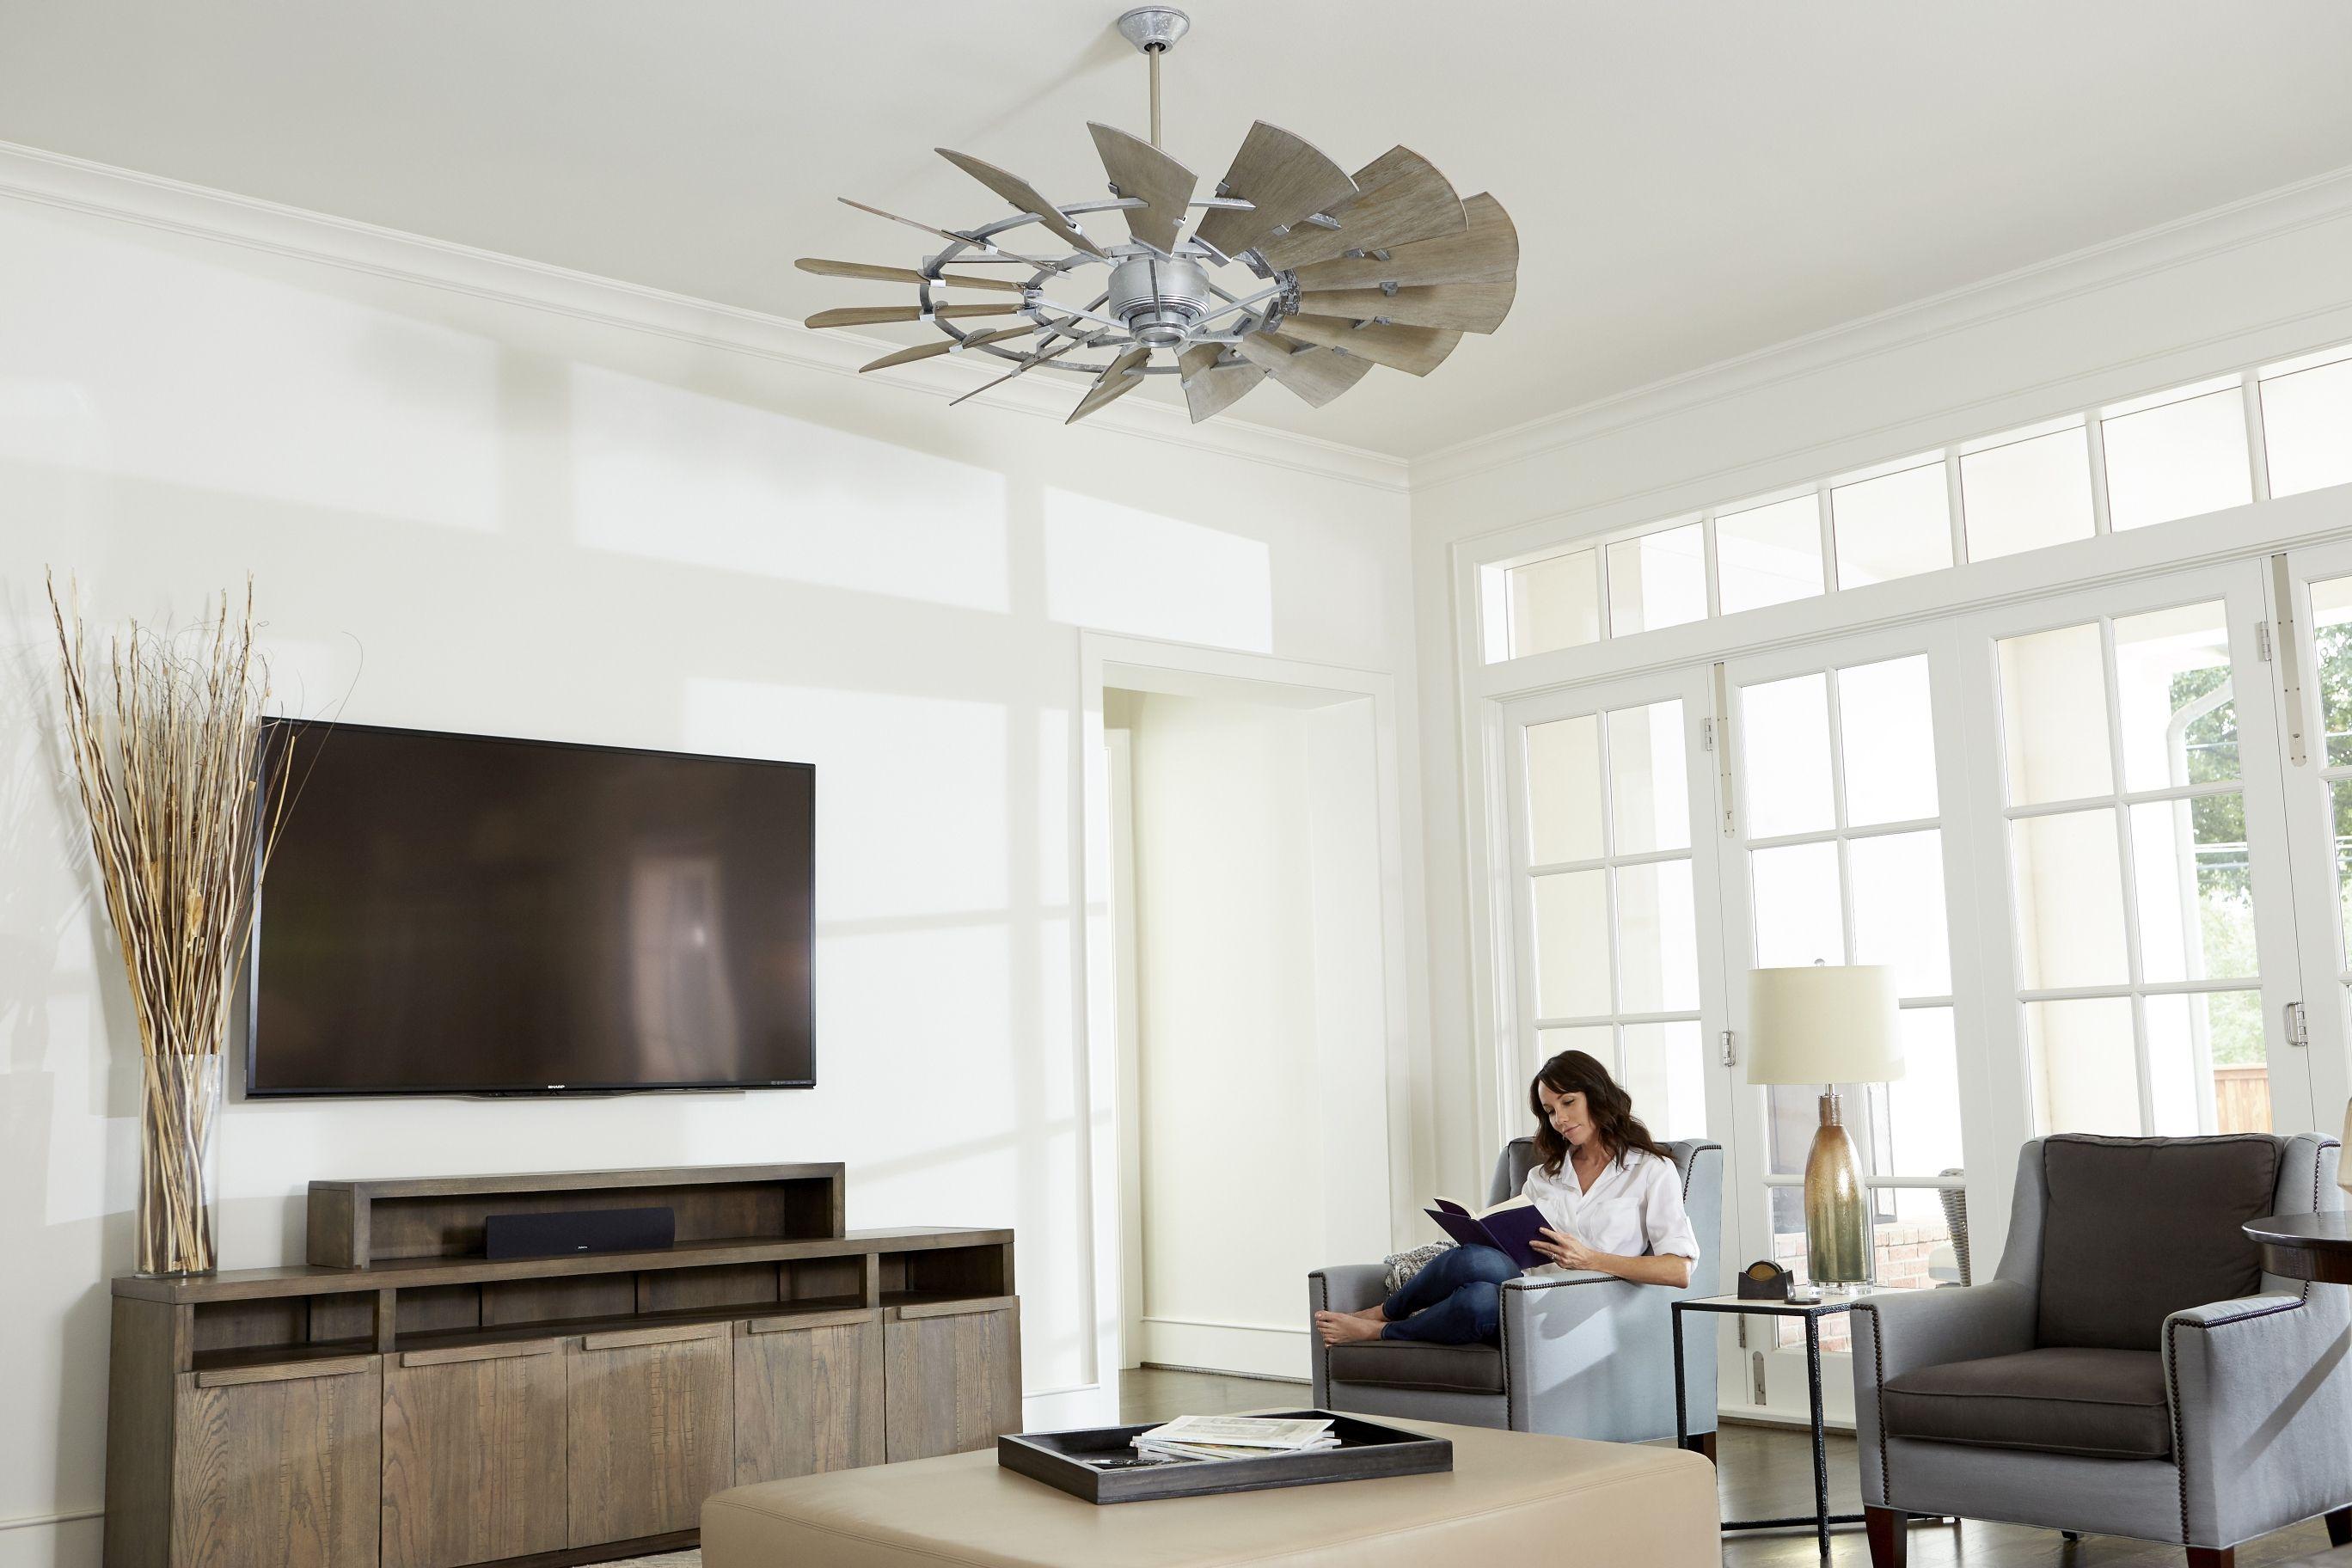 "Quorum Windmill 60"" 15 Blade Indoor Ceiling Fan in Galvanized"